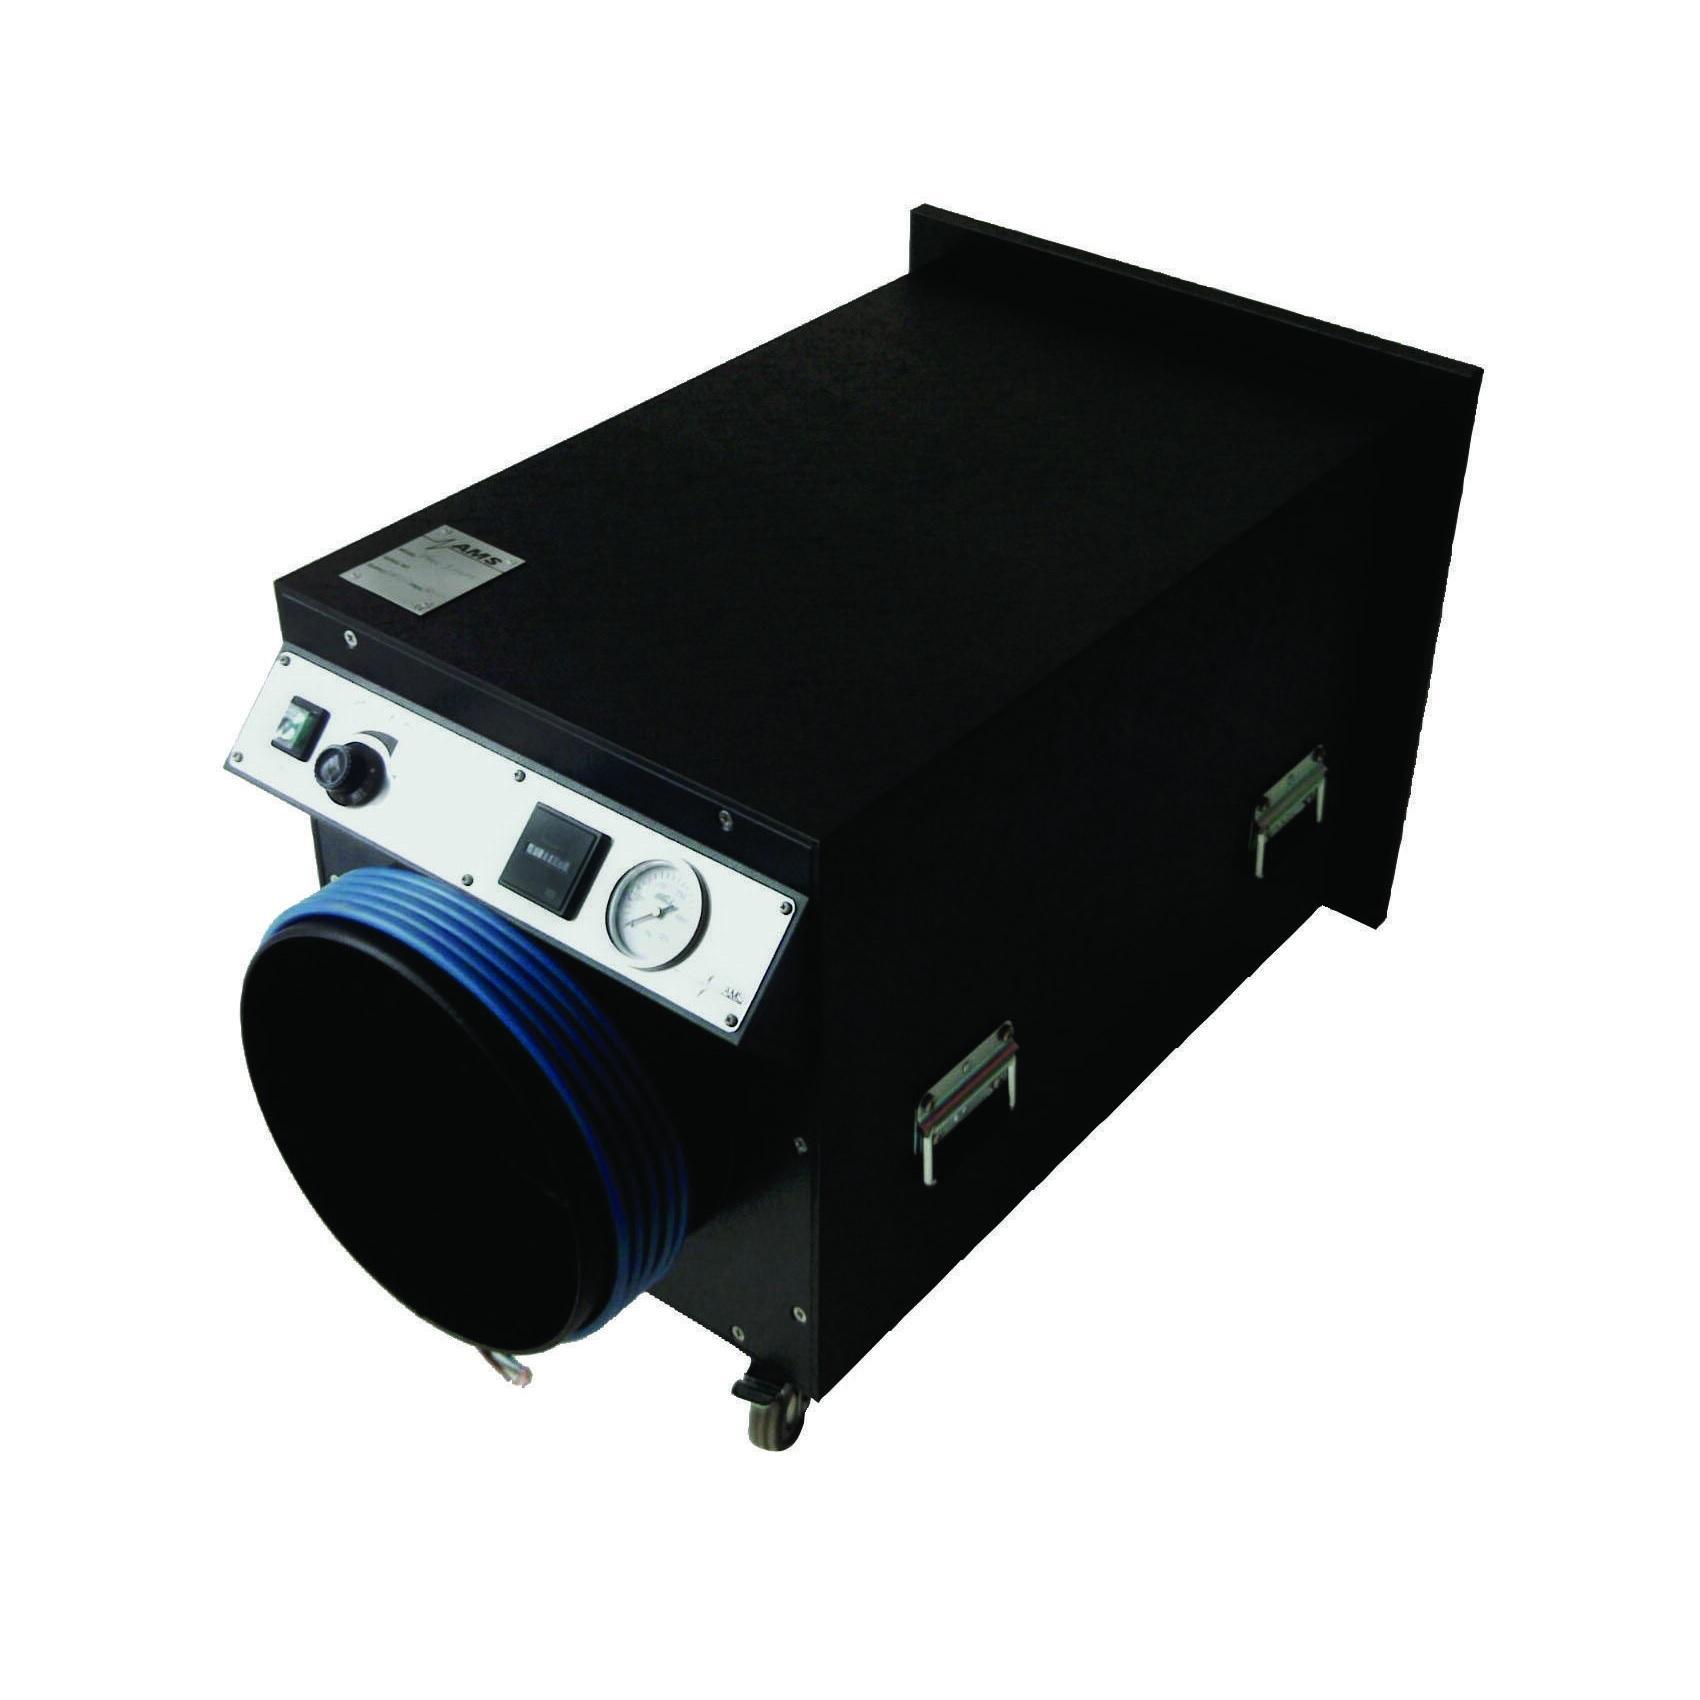 AMS1500 Negative Pressure Unit 1500